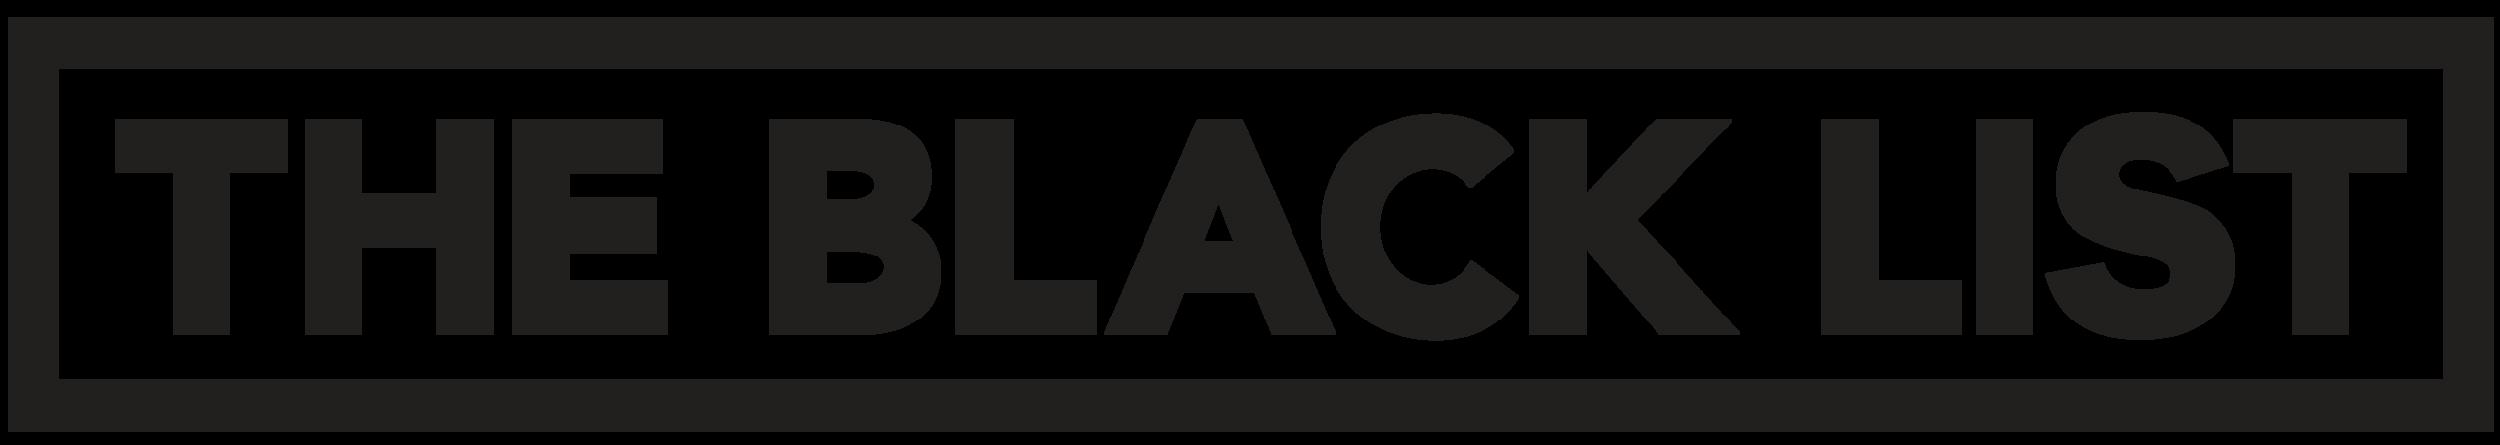 Black_List_logo copy.png